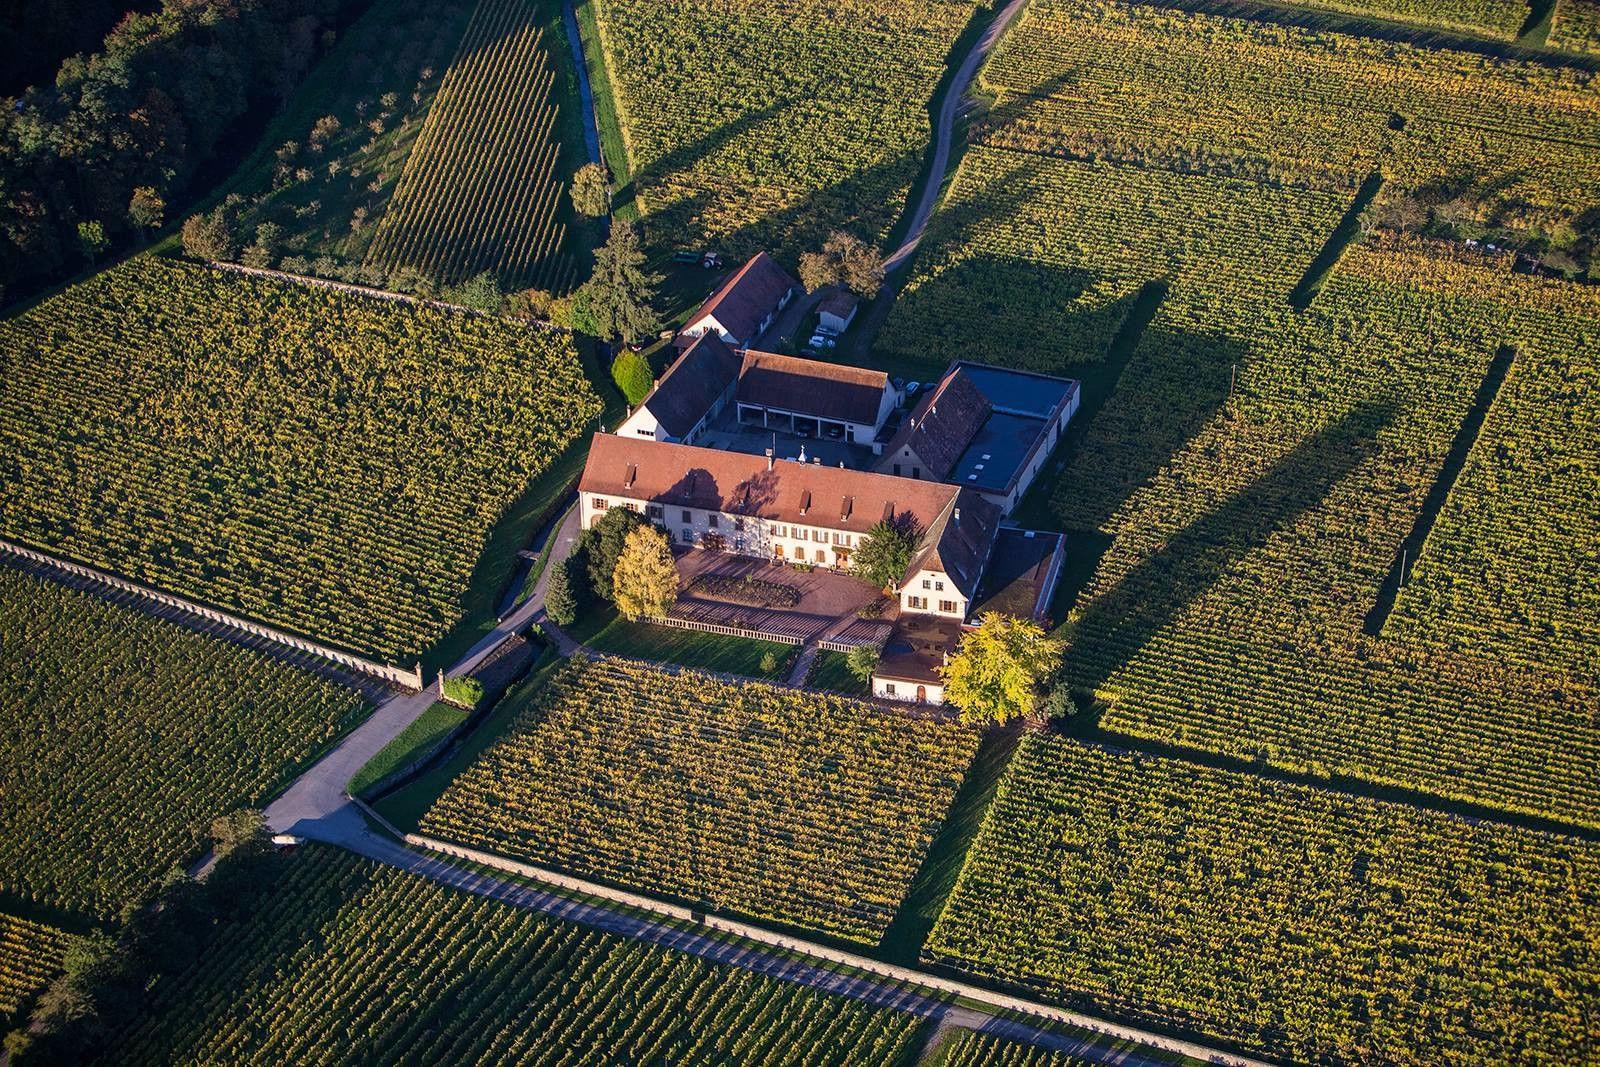 Domaine Weinbach Overhead view